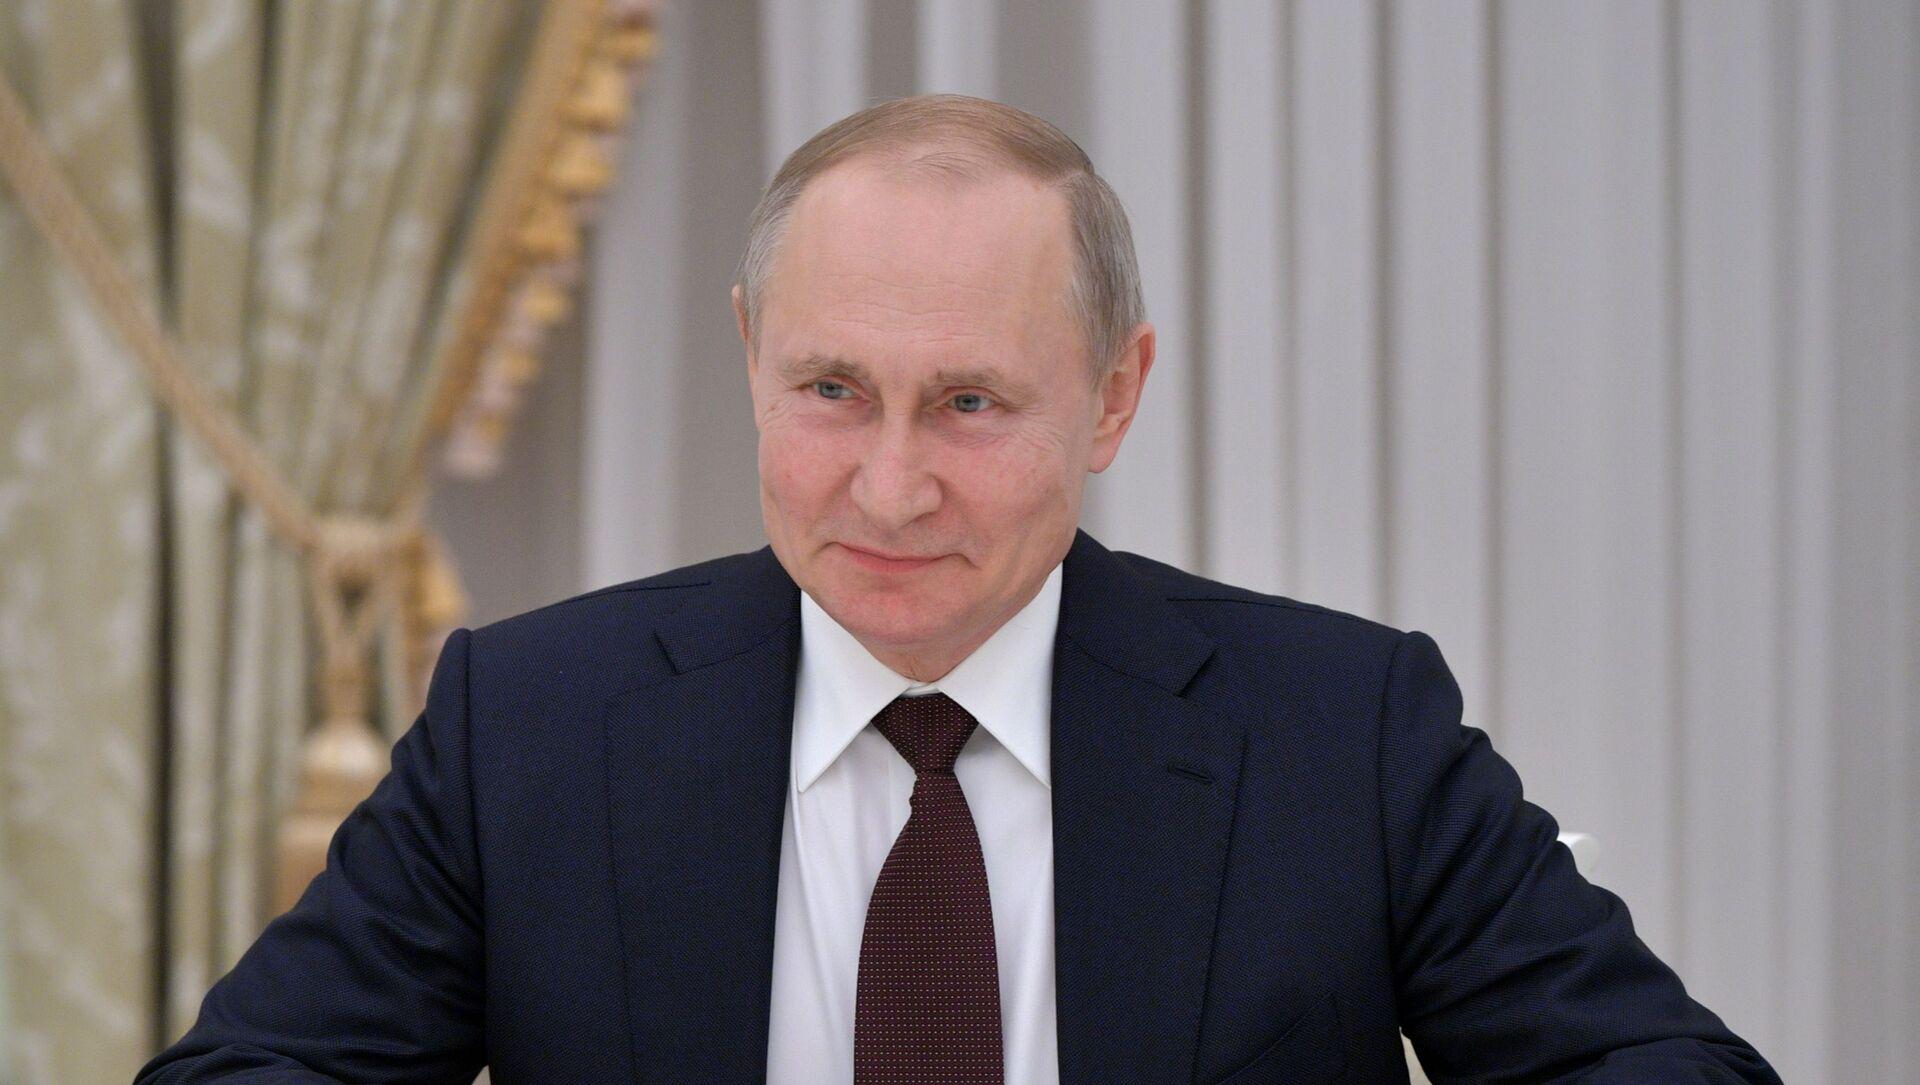 Tổng thống Nga Vladimir Putin. - Sputnik Việt Nam, 1920, 30.03.2021